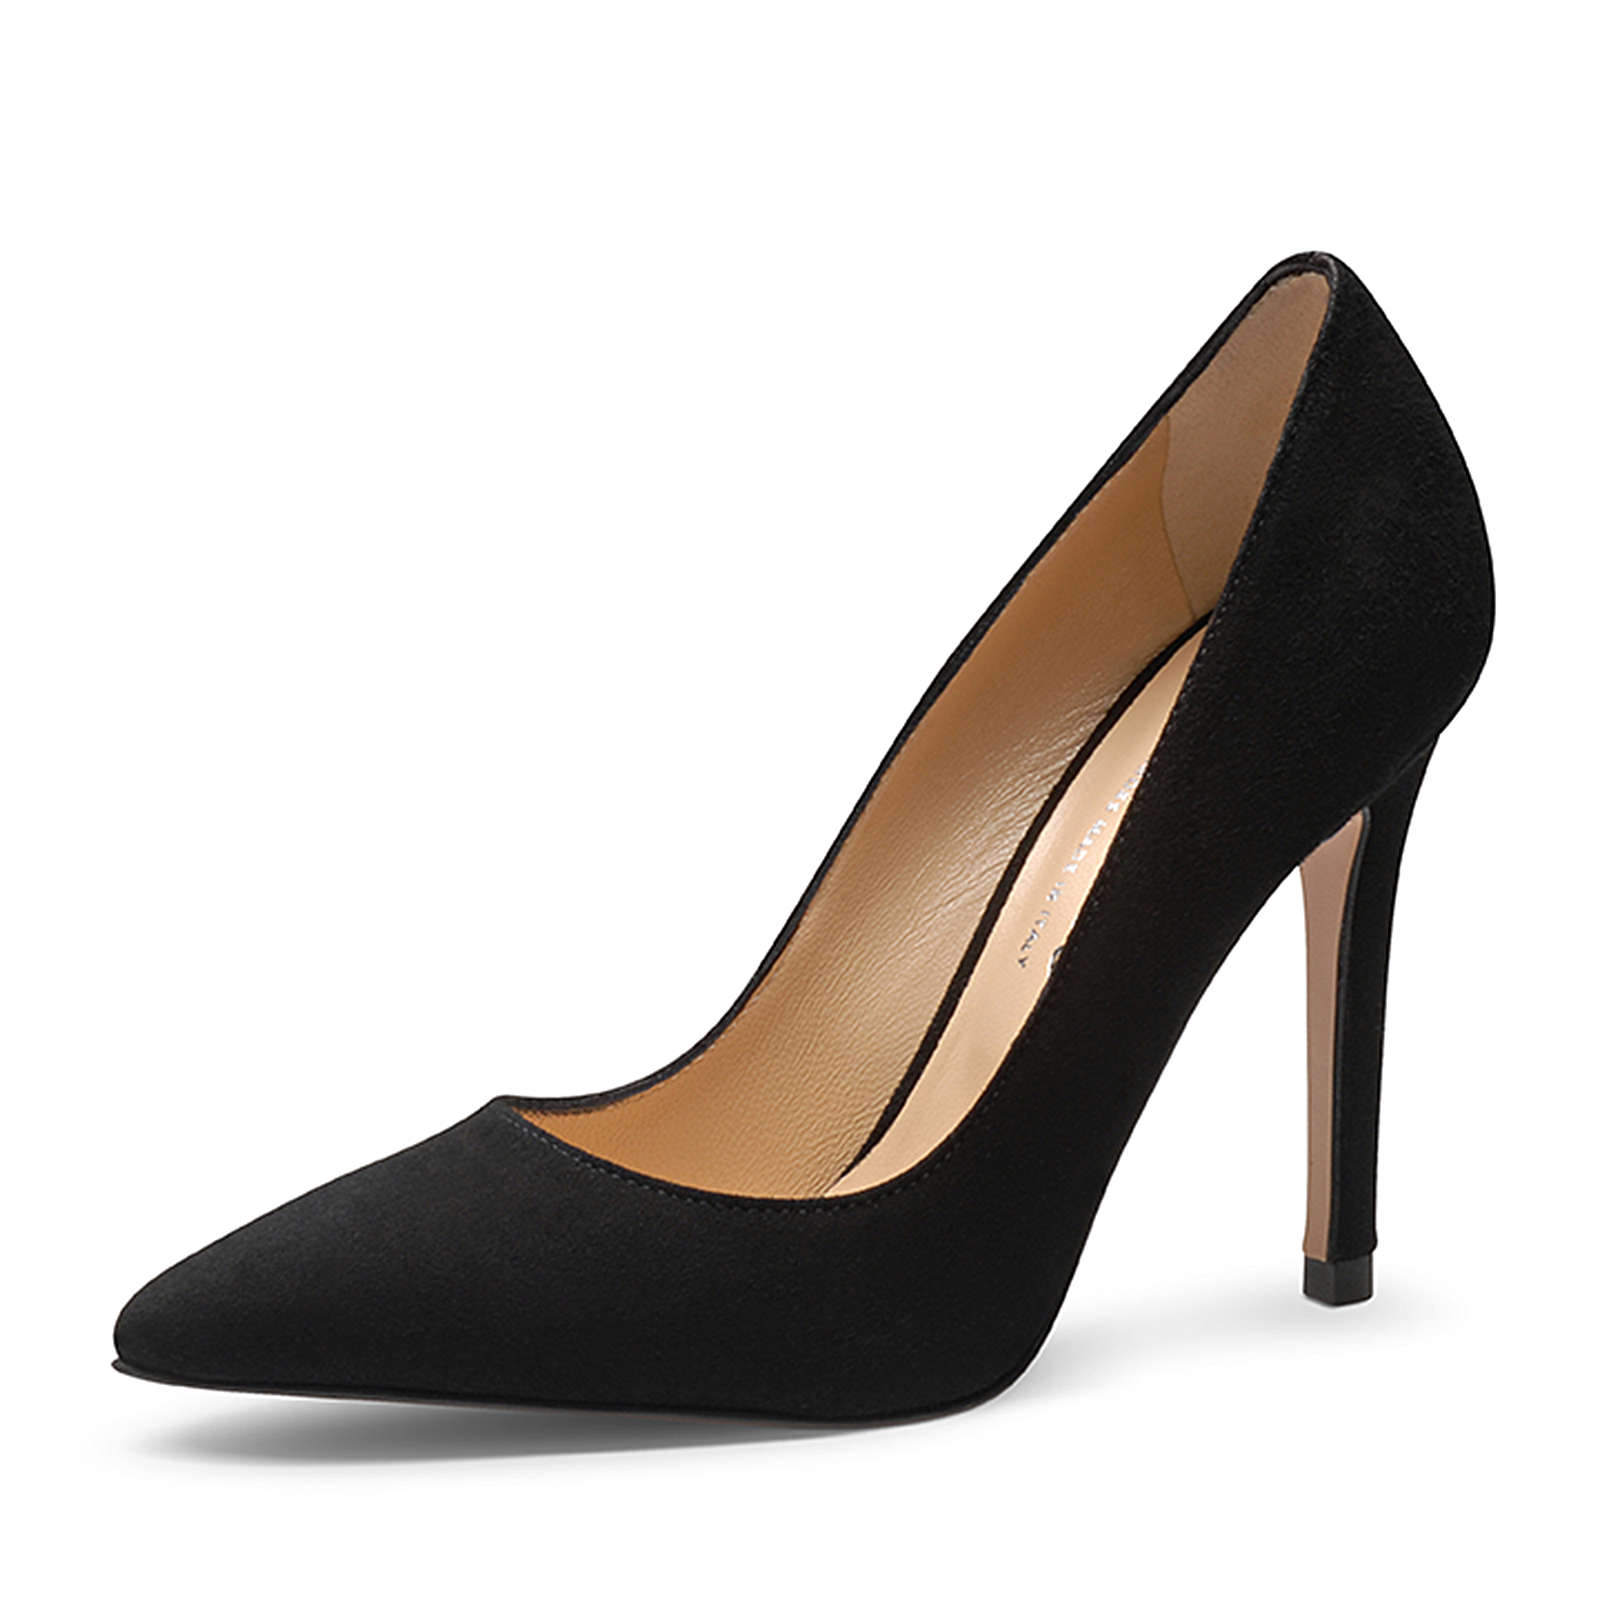 Evita Shoes Pumps schwarz Damen Gr. 38